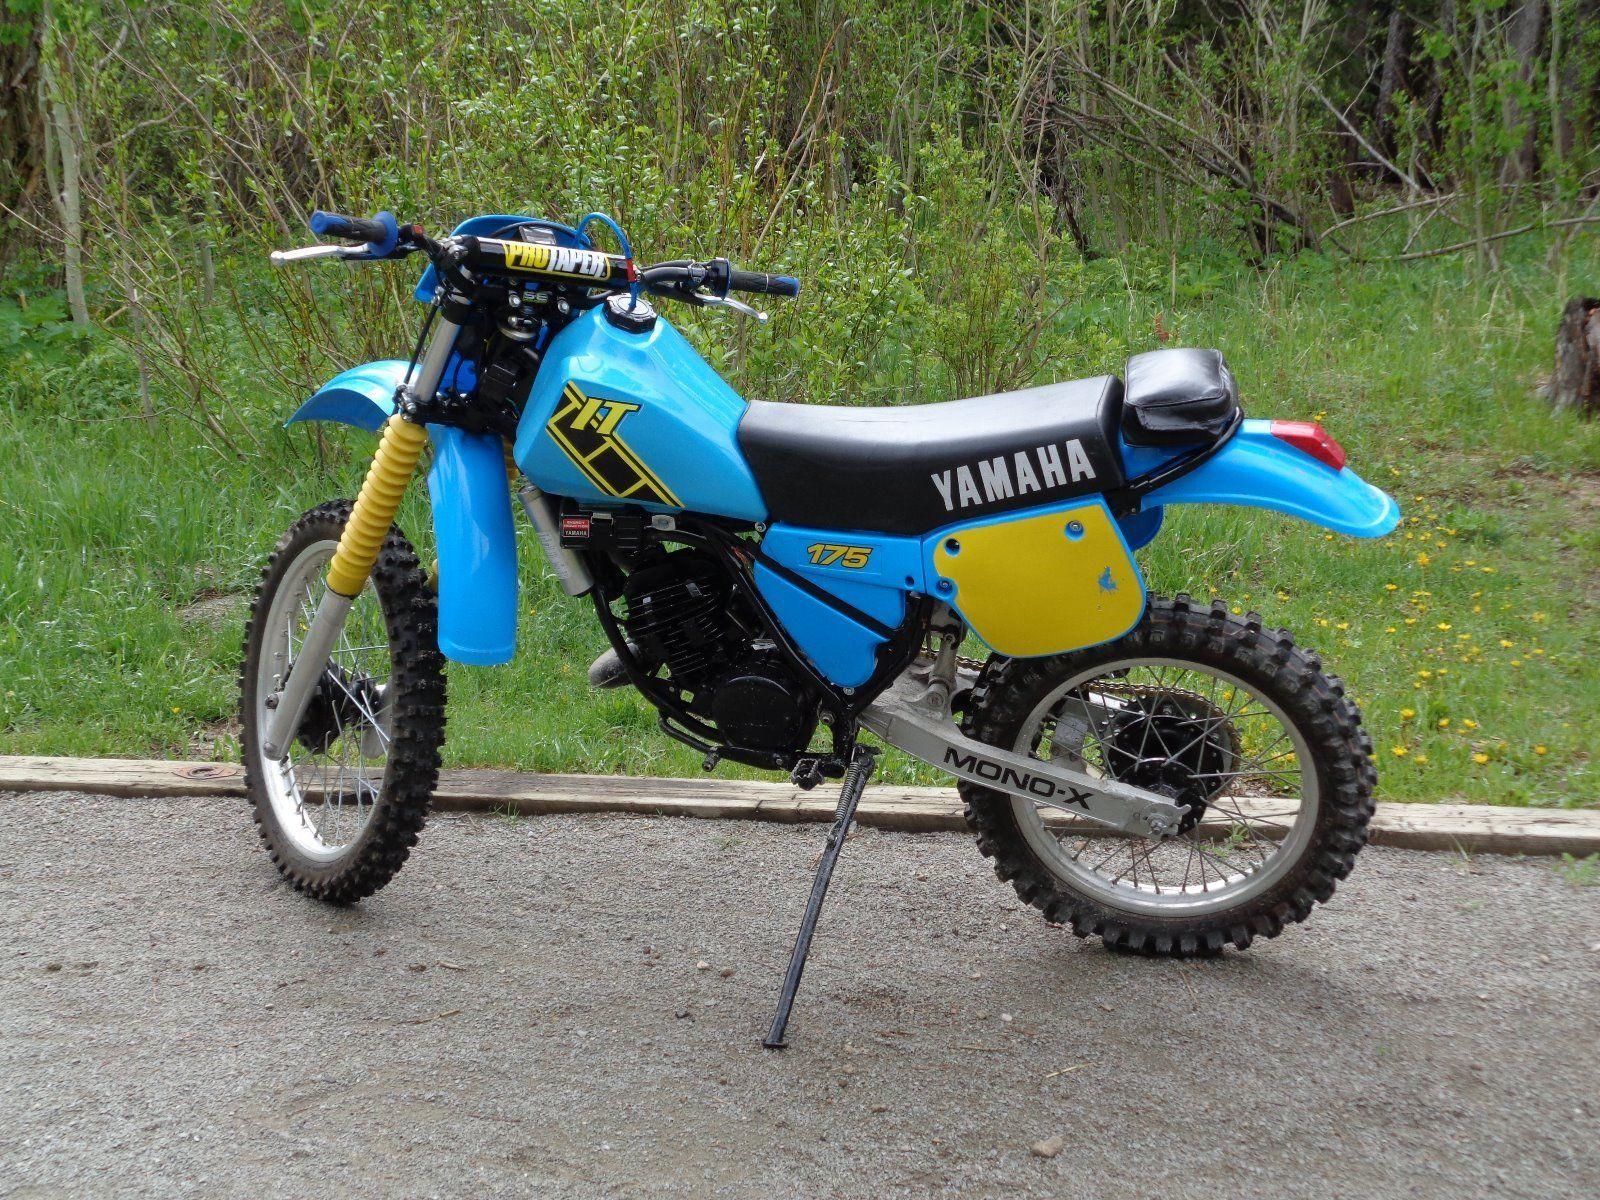 83 Yamaha It175 Vintage Dirt Bike Yamaha It 175 Bike Yamaha